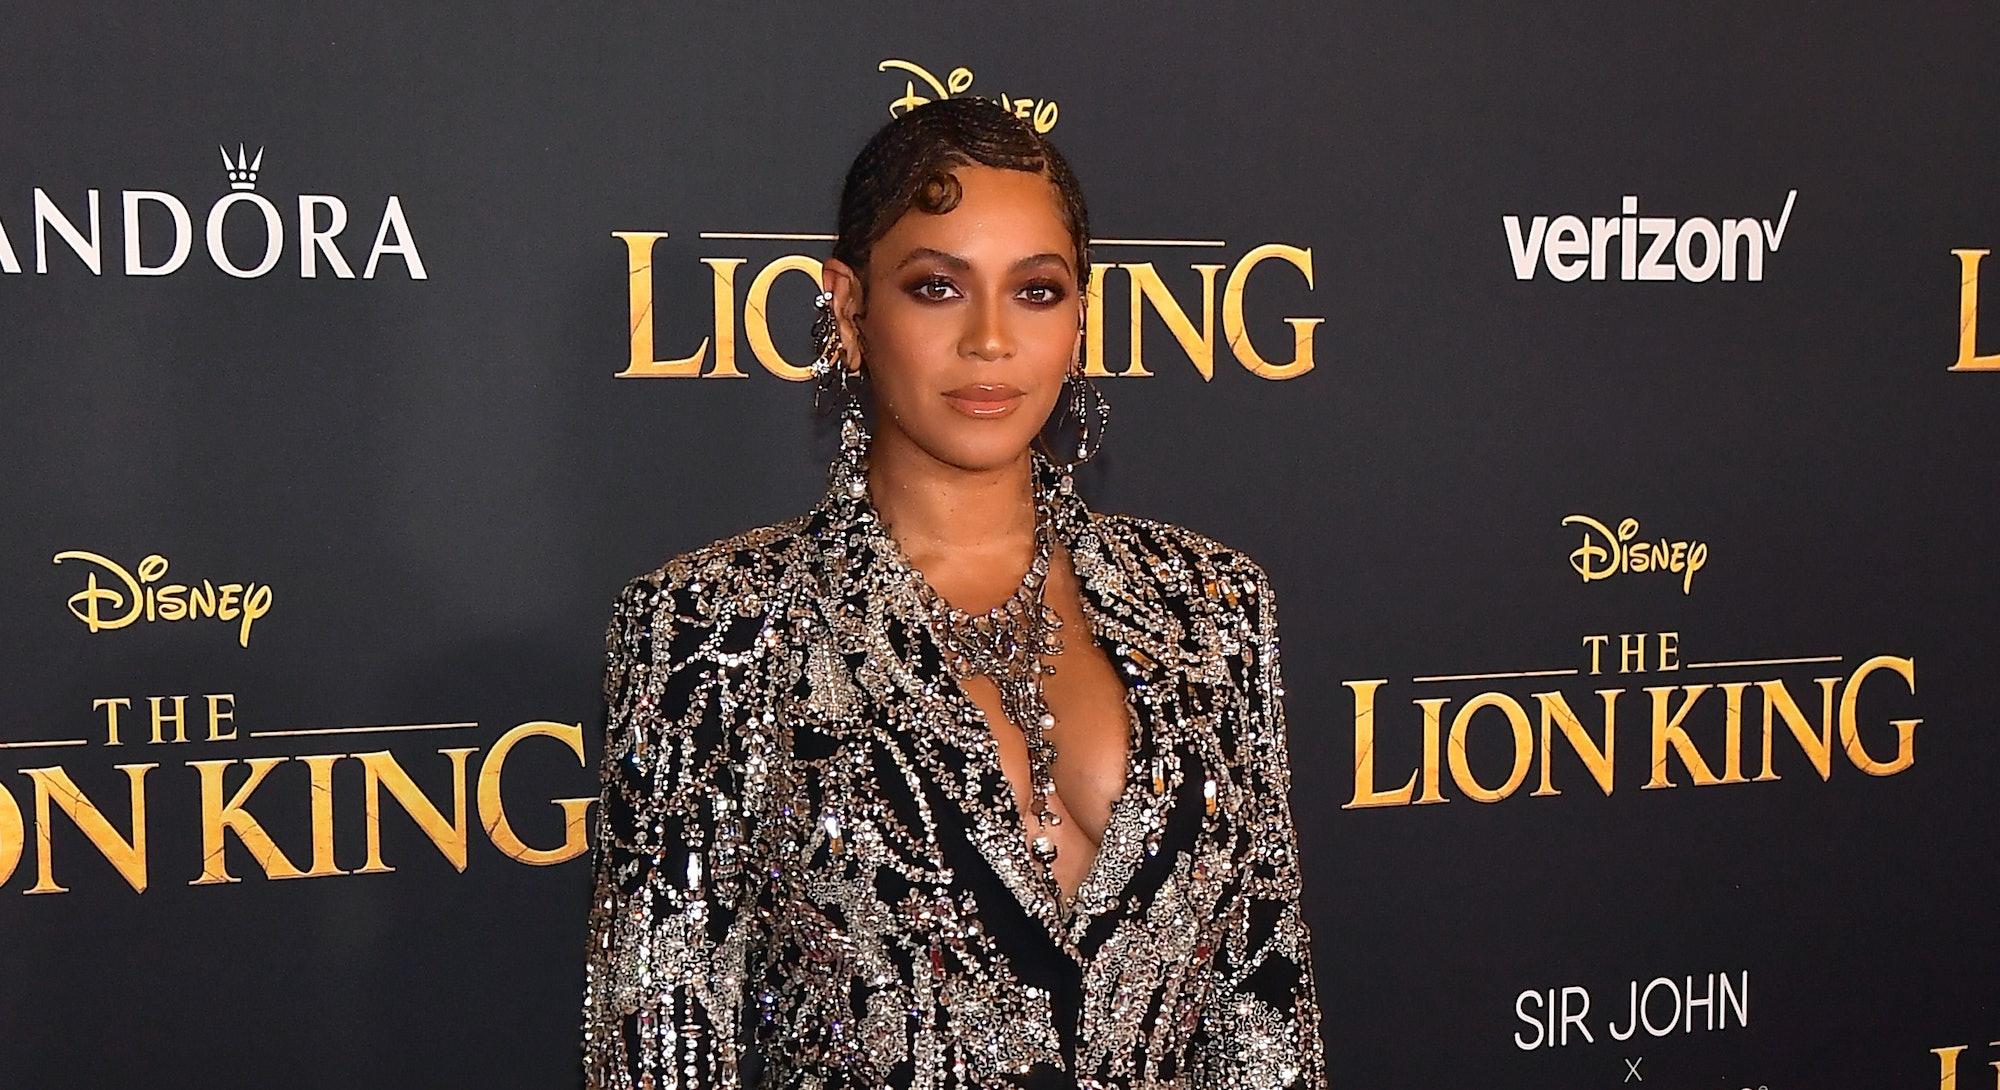 Beyoncé at the 2019 premiere of The Lion King.